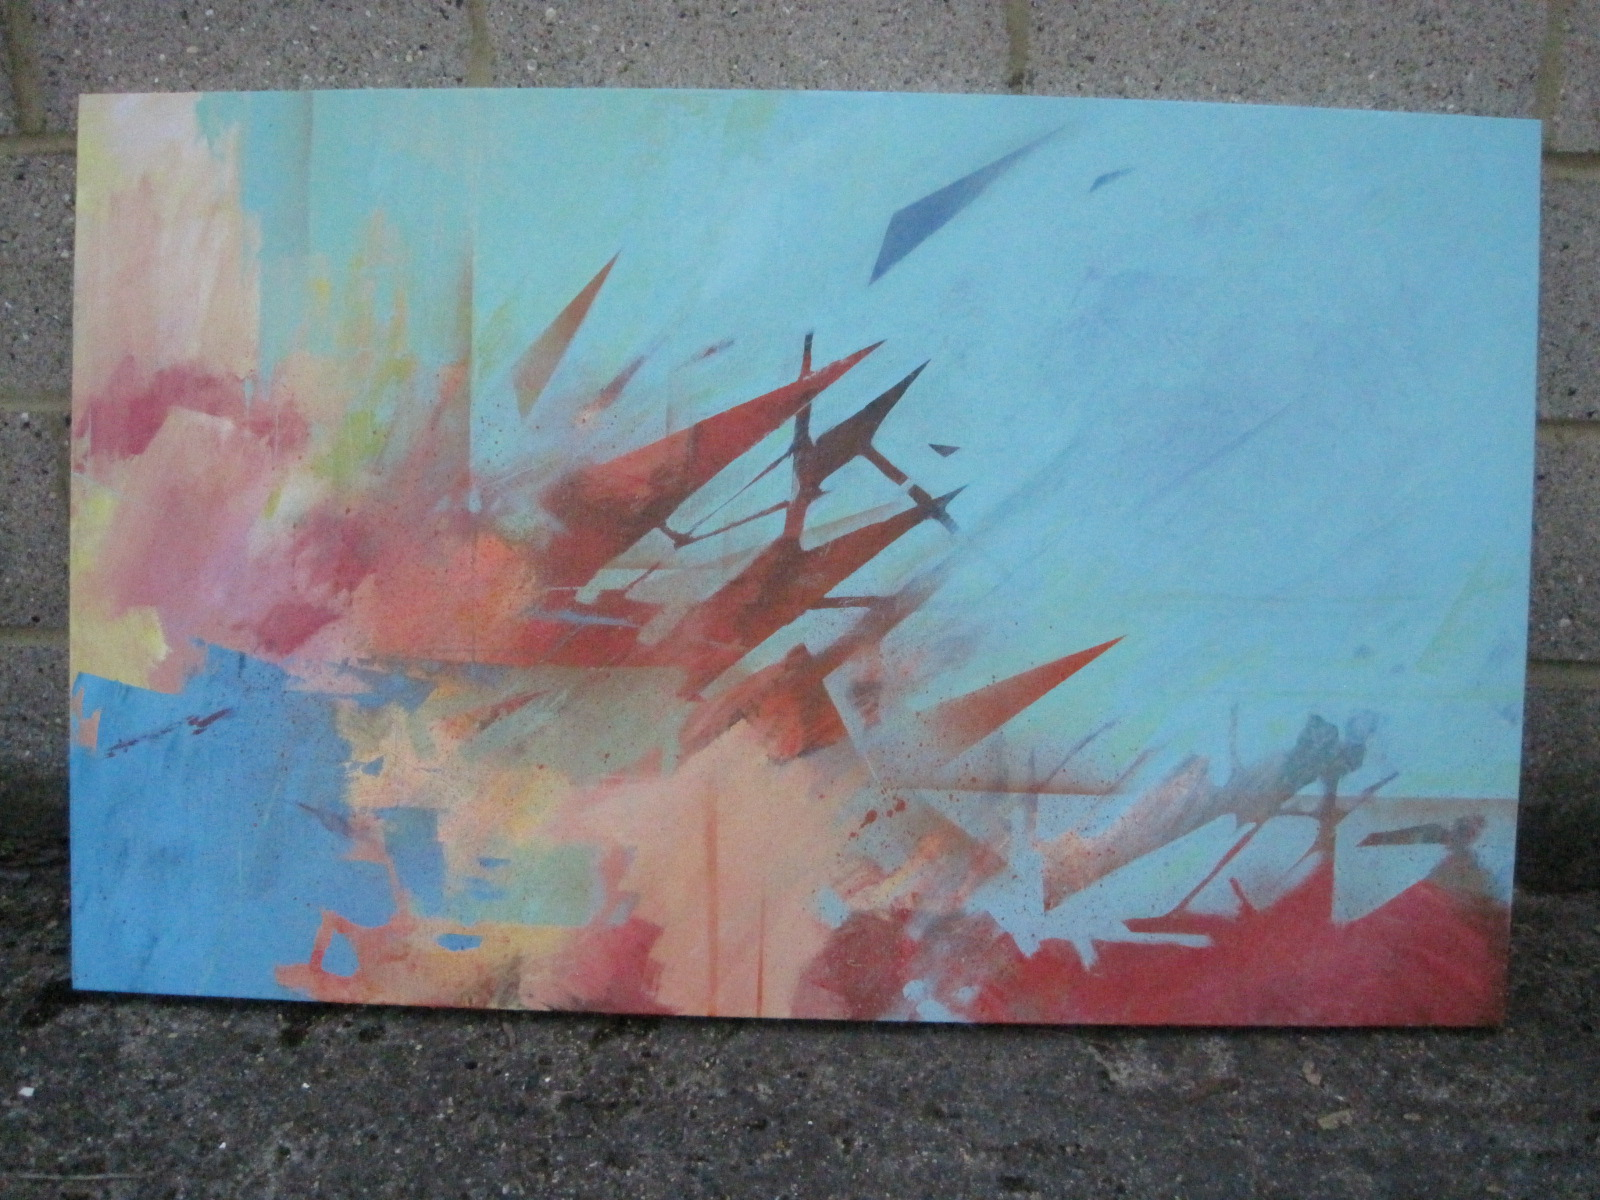 'Extrapolation' 2010 (270x95cm) Mixed Media on Canvas